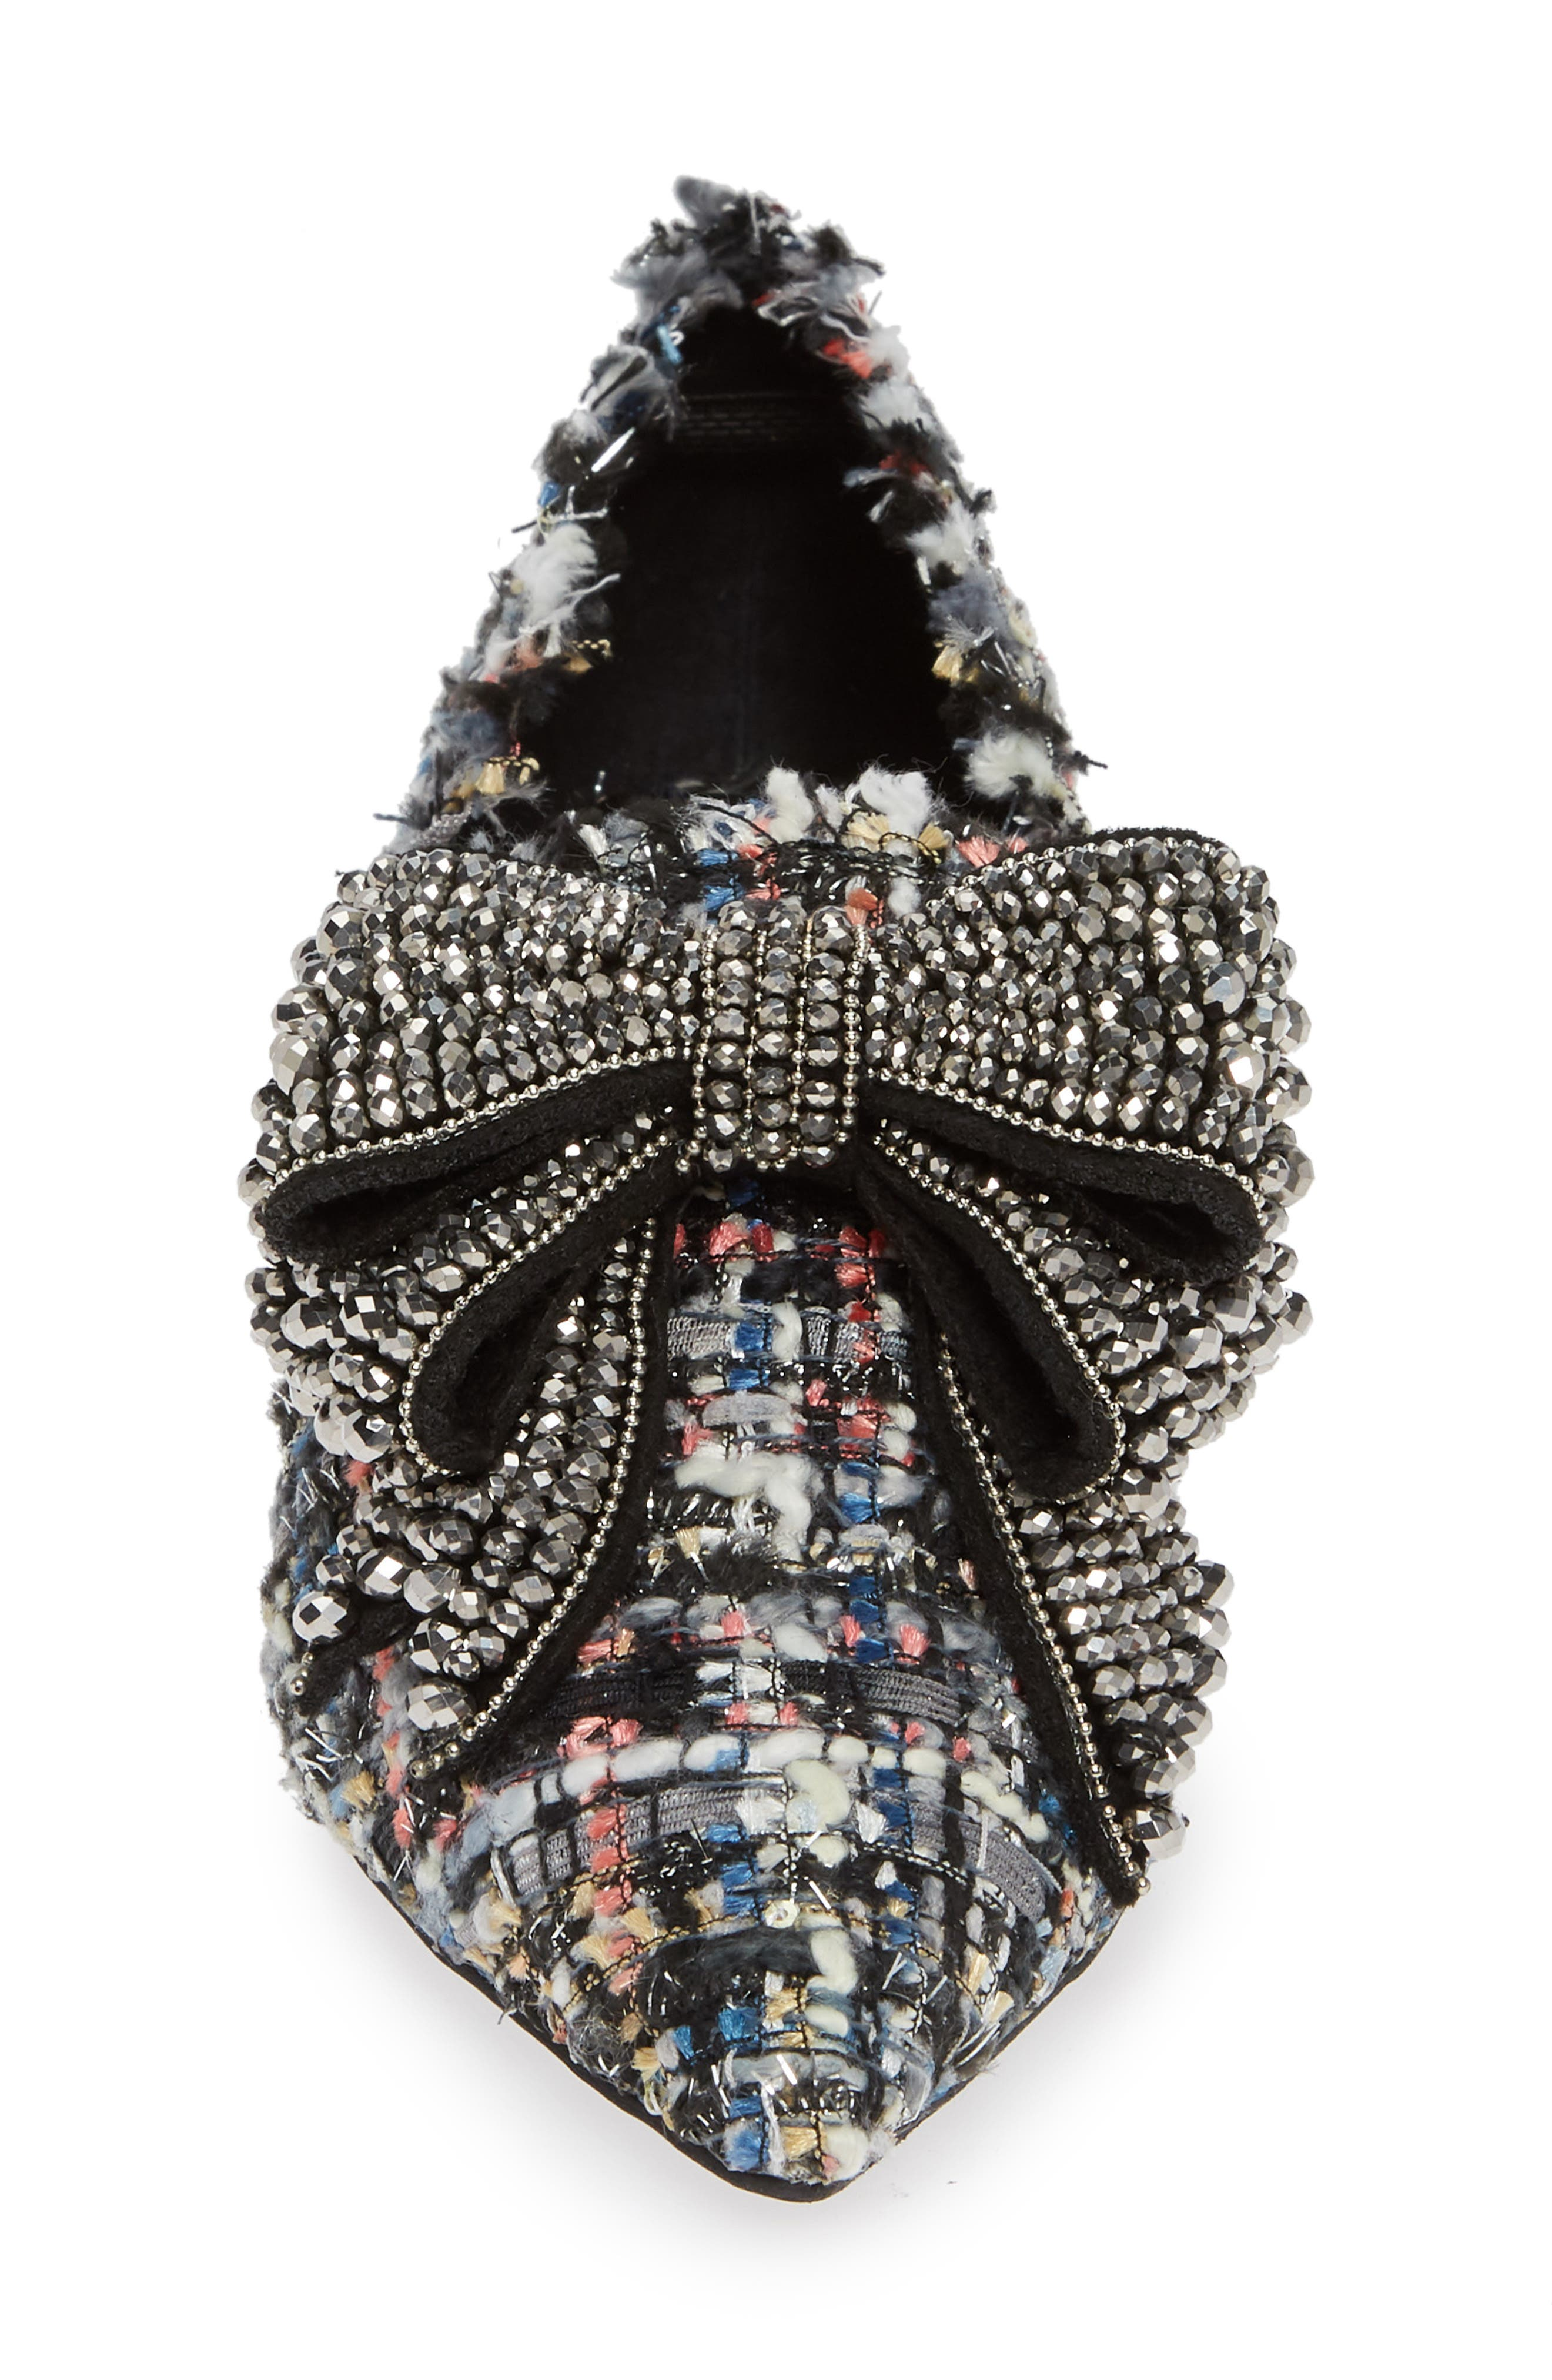 Valenti Embellished Bow Loafer,                             Alternate thumbnail 6, color,                             Black Multi Tweed Pewter